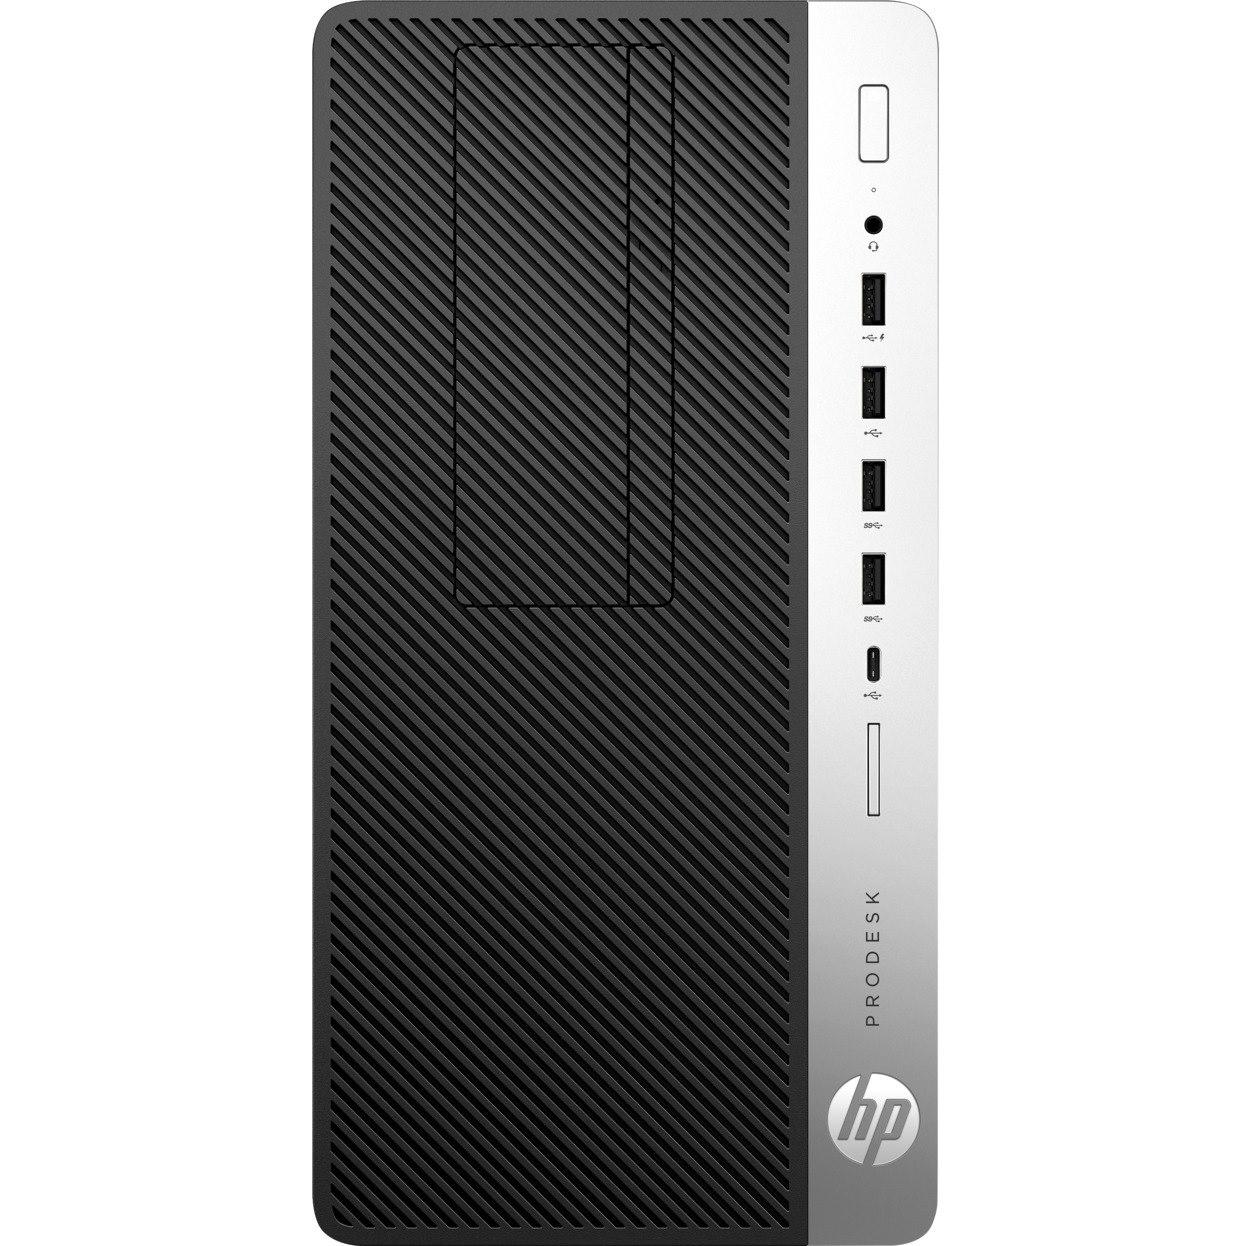 HP Business Desktop ProDesk 600 G3 Desktop Computer - Intel Core i5 (7th Gen) i5-7500 3.40 GHz - 8 GB DDR4 SDRAM - 256 GB SSD - Windows 10 Pro 64-bit - Micro Tower